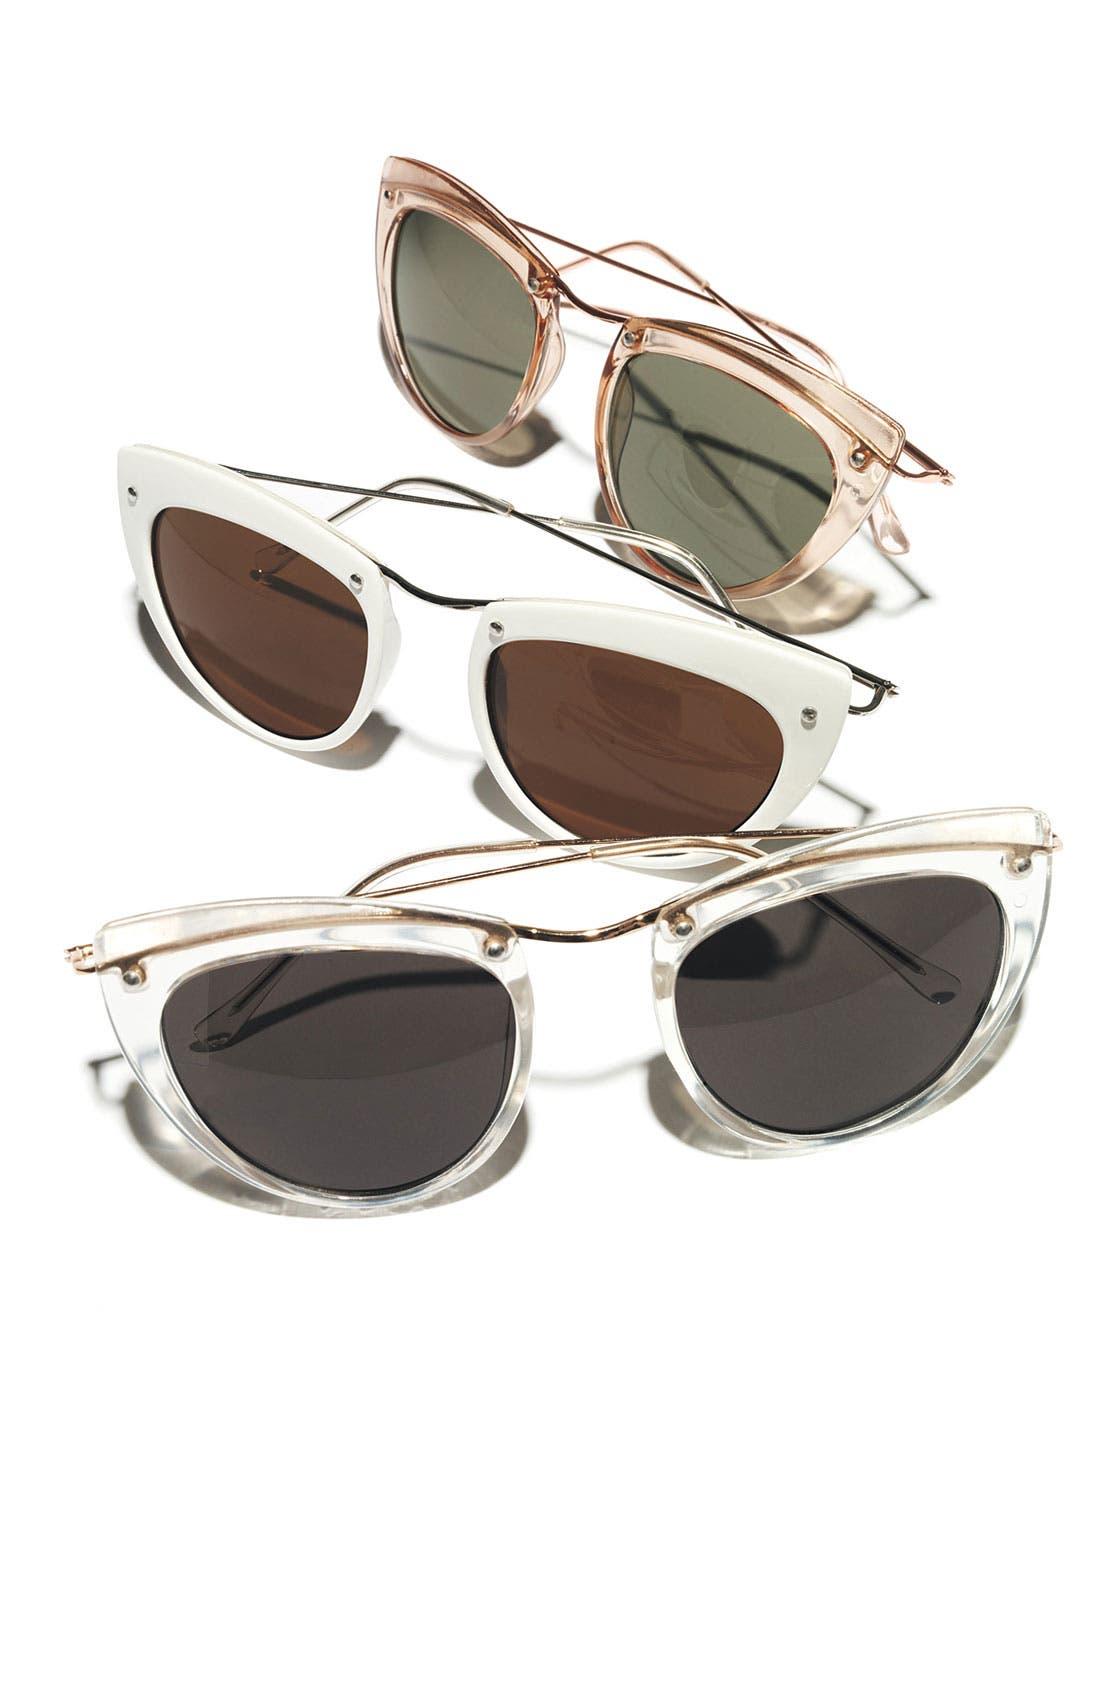 49mm Retro Sunglasses,                             Alternate thumbnail 3, color,                             300